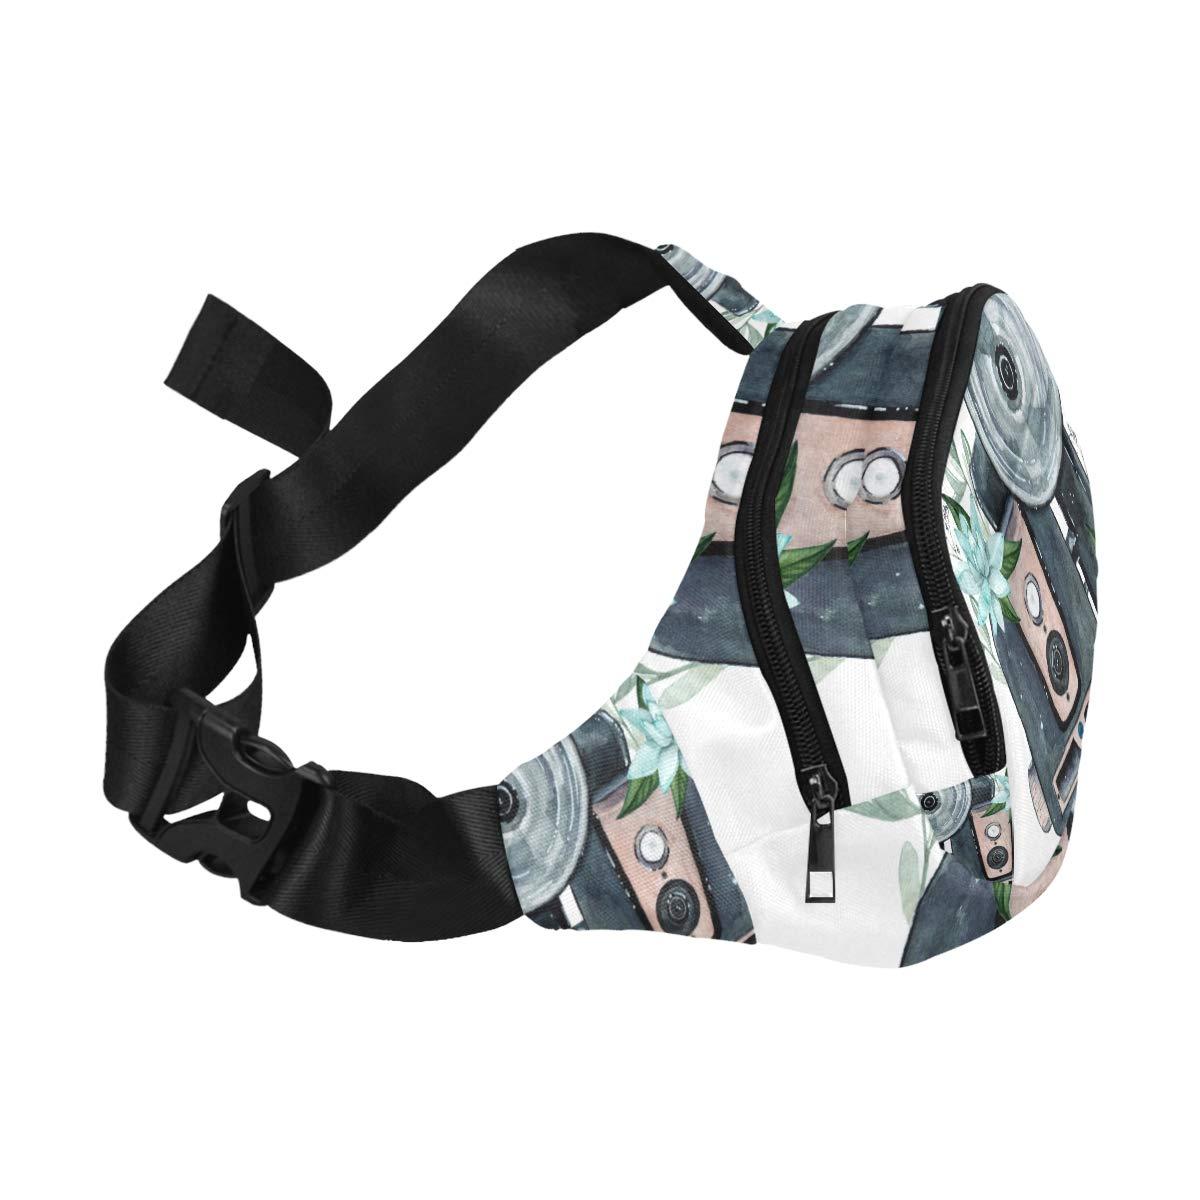 Vintage Retro Watercolor Camera Fenny Packs Waist Bags Adjustable Belt Waterproof Nylon Travel Running Sport Vacation Party For Men Women Boys Girls Kids